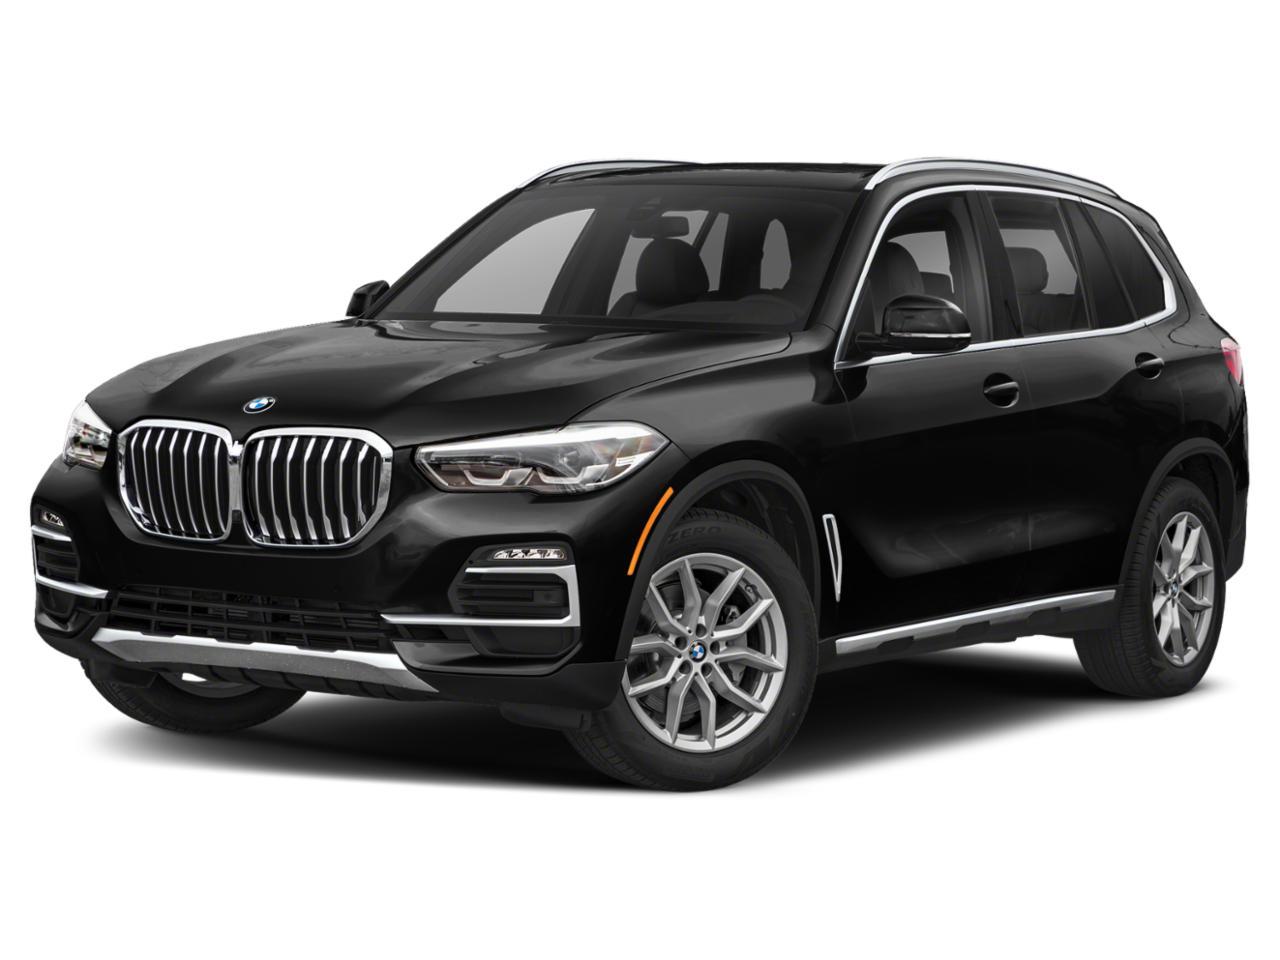 2020 BMW X5 sDrive40i Vehicle Photo in Pleasanton, CA 94588